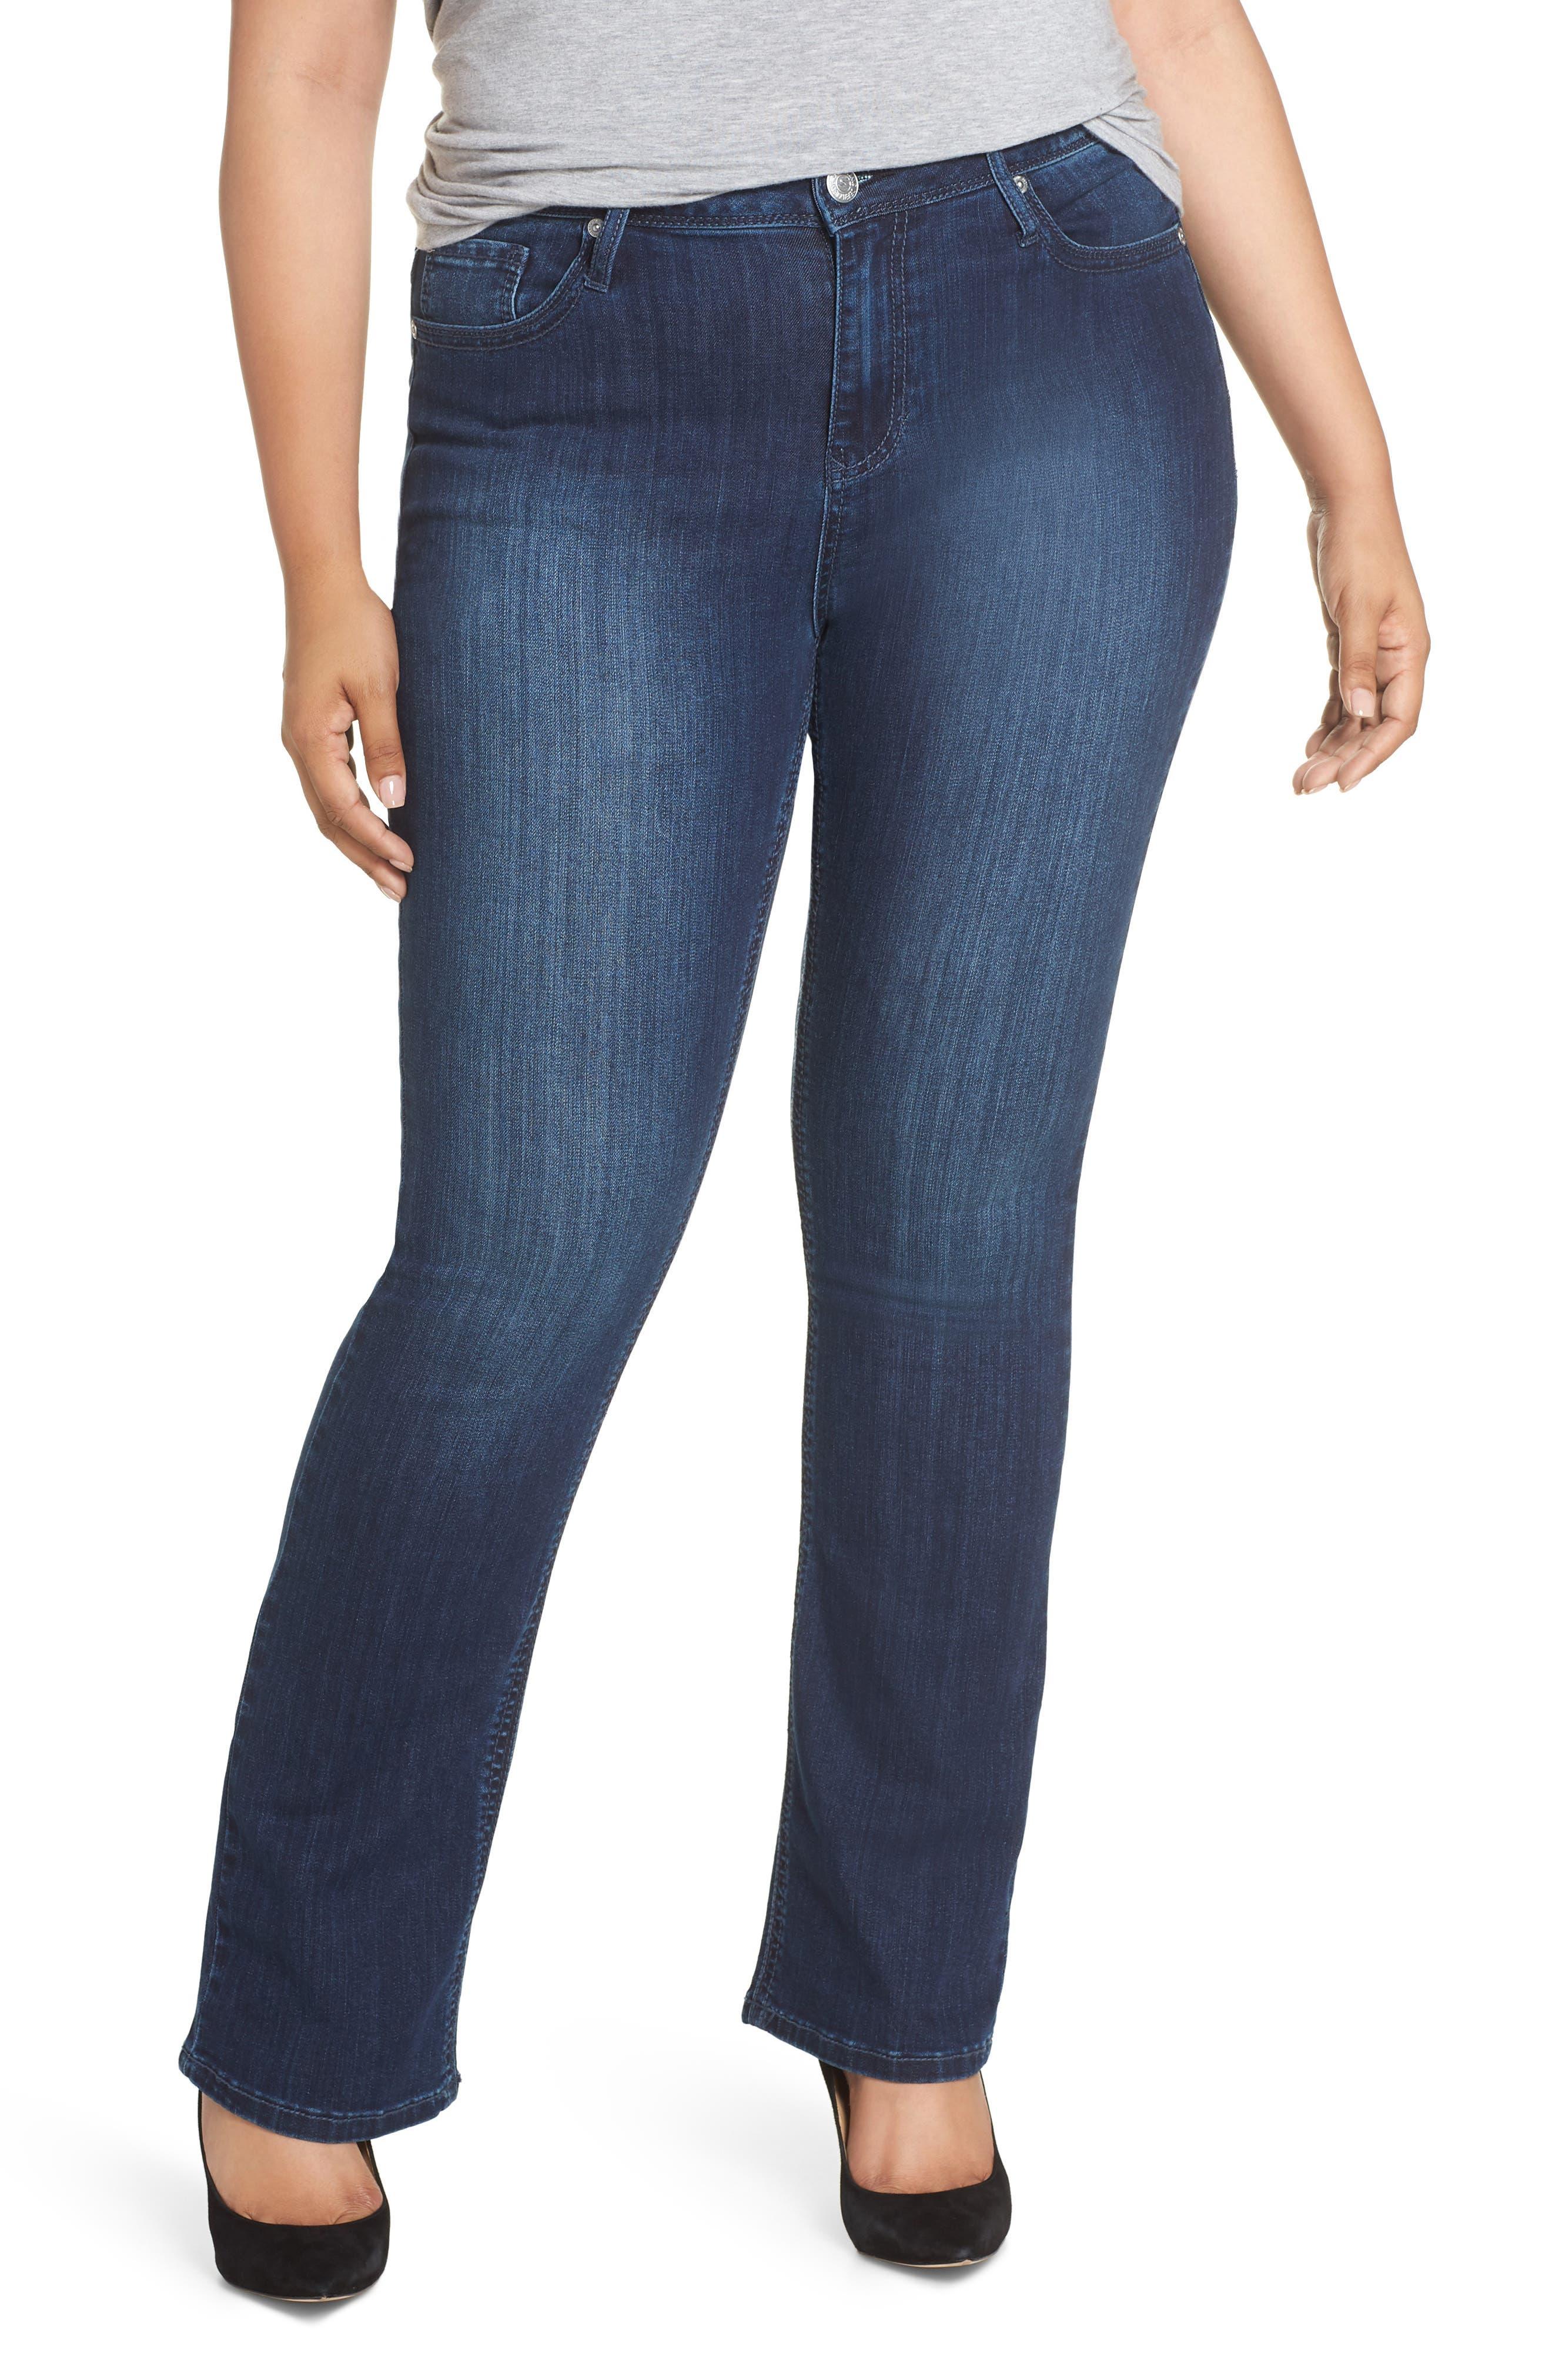 SEVEN7, Rocker Flap Pocket Slim Bootcut Jeans, Main thumbnail 1, color, CHALLENGER